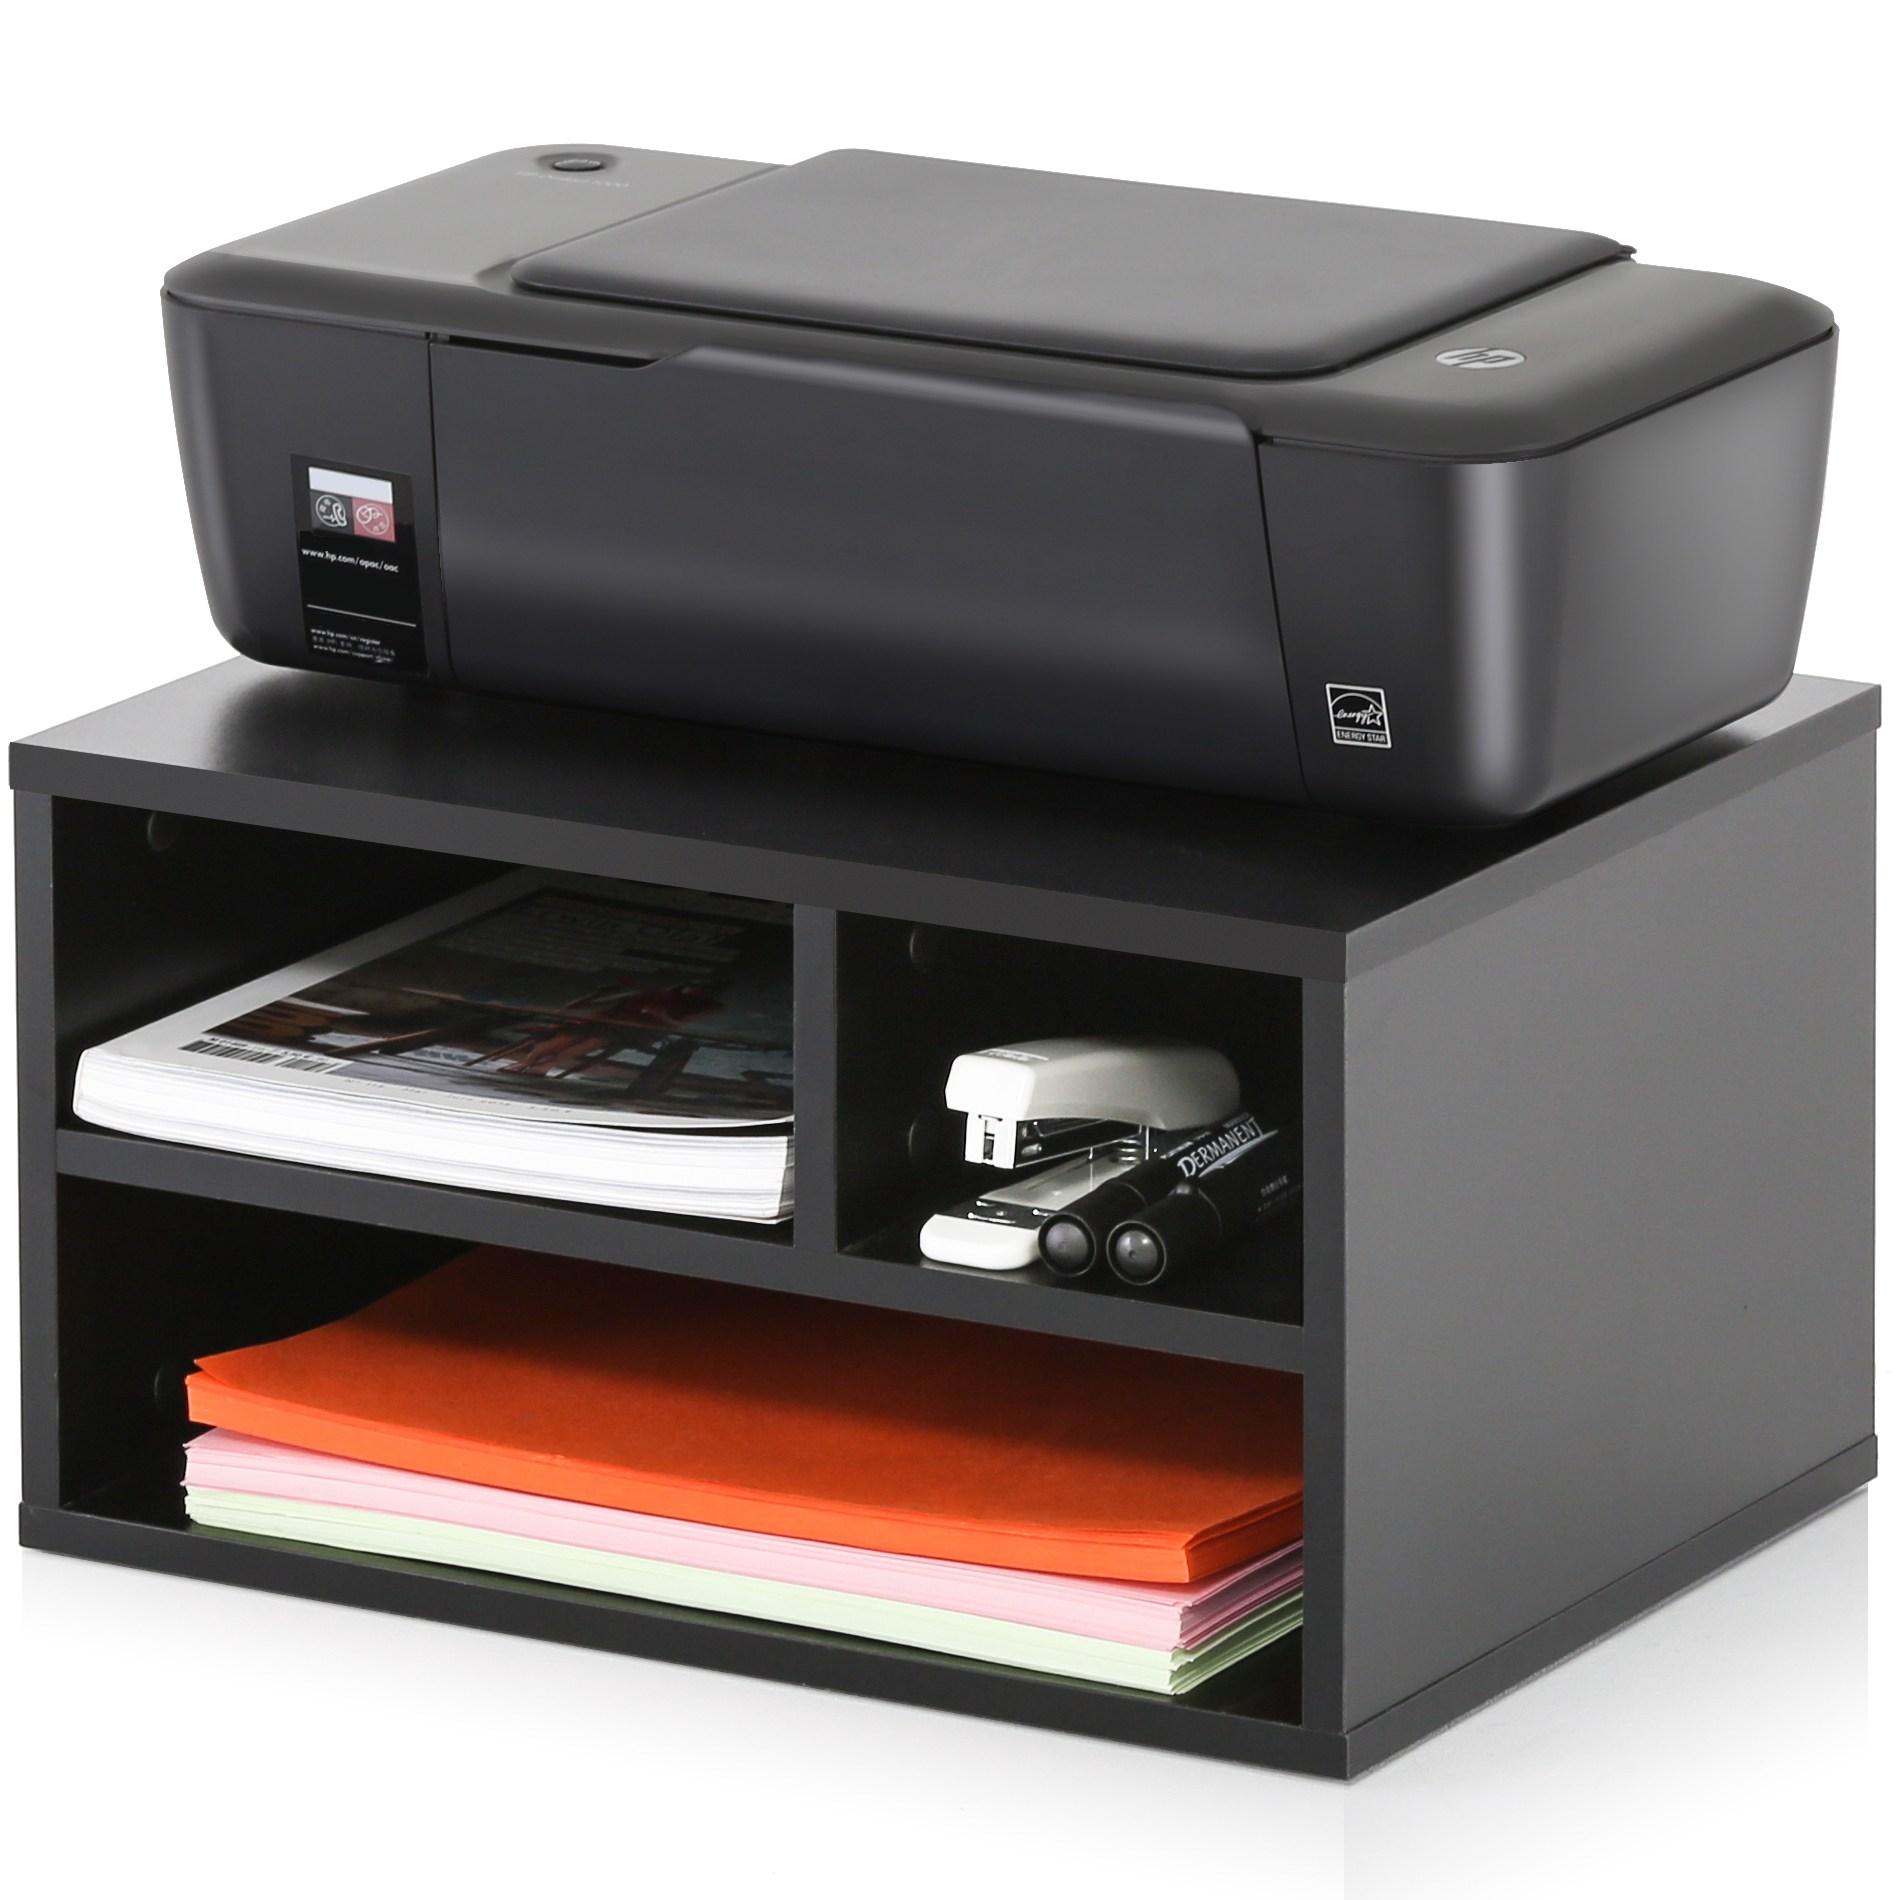 FITUEYES 프린터선반 프린터받침 프린터스탠드, 블랙 DO304001WB